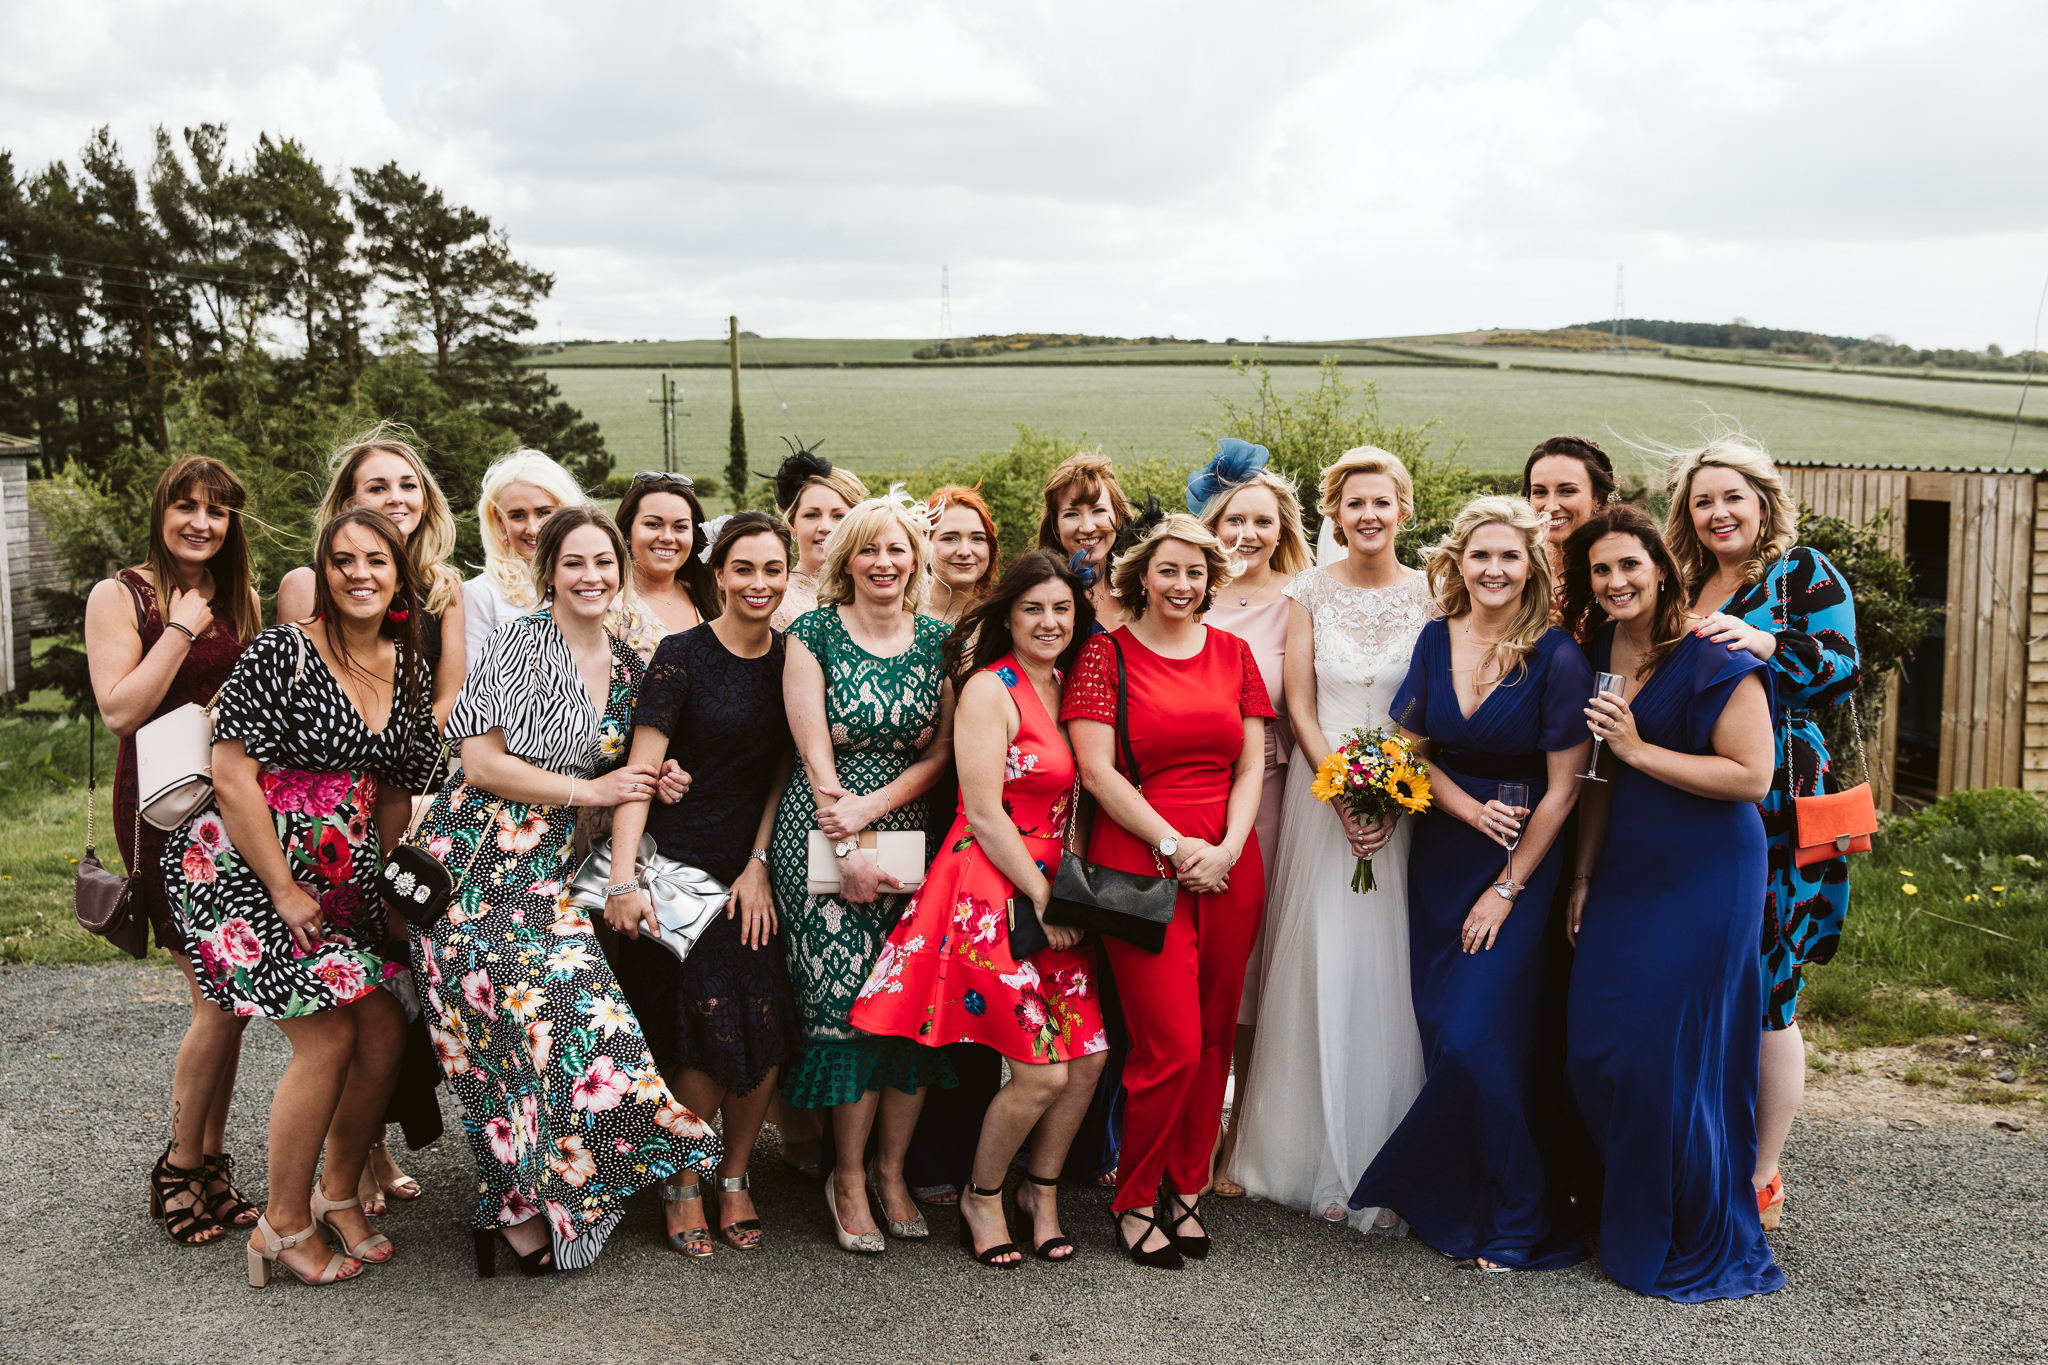 northside-farm-wedding-northumberland-margarita-hope (50).jpg